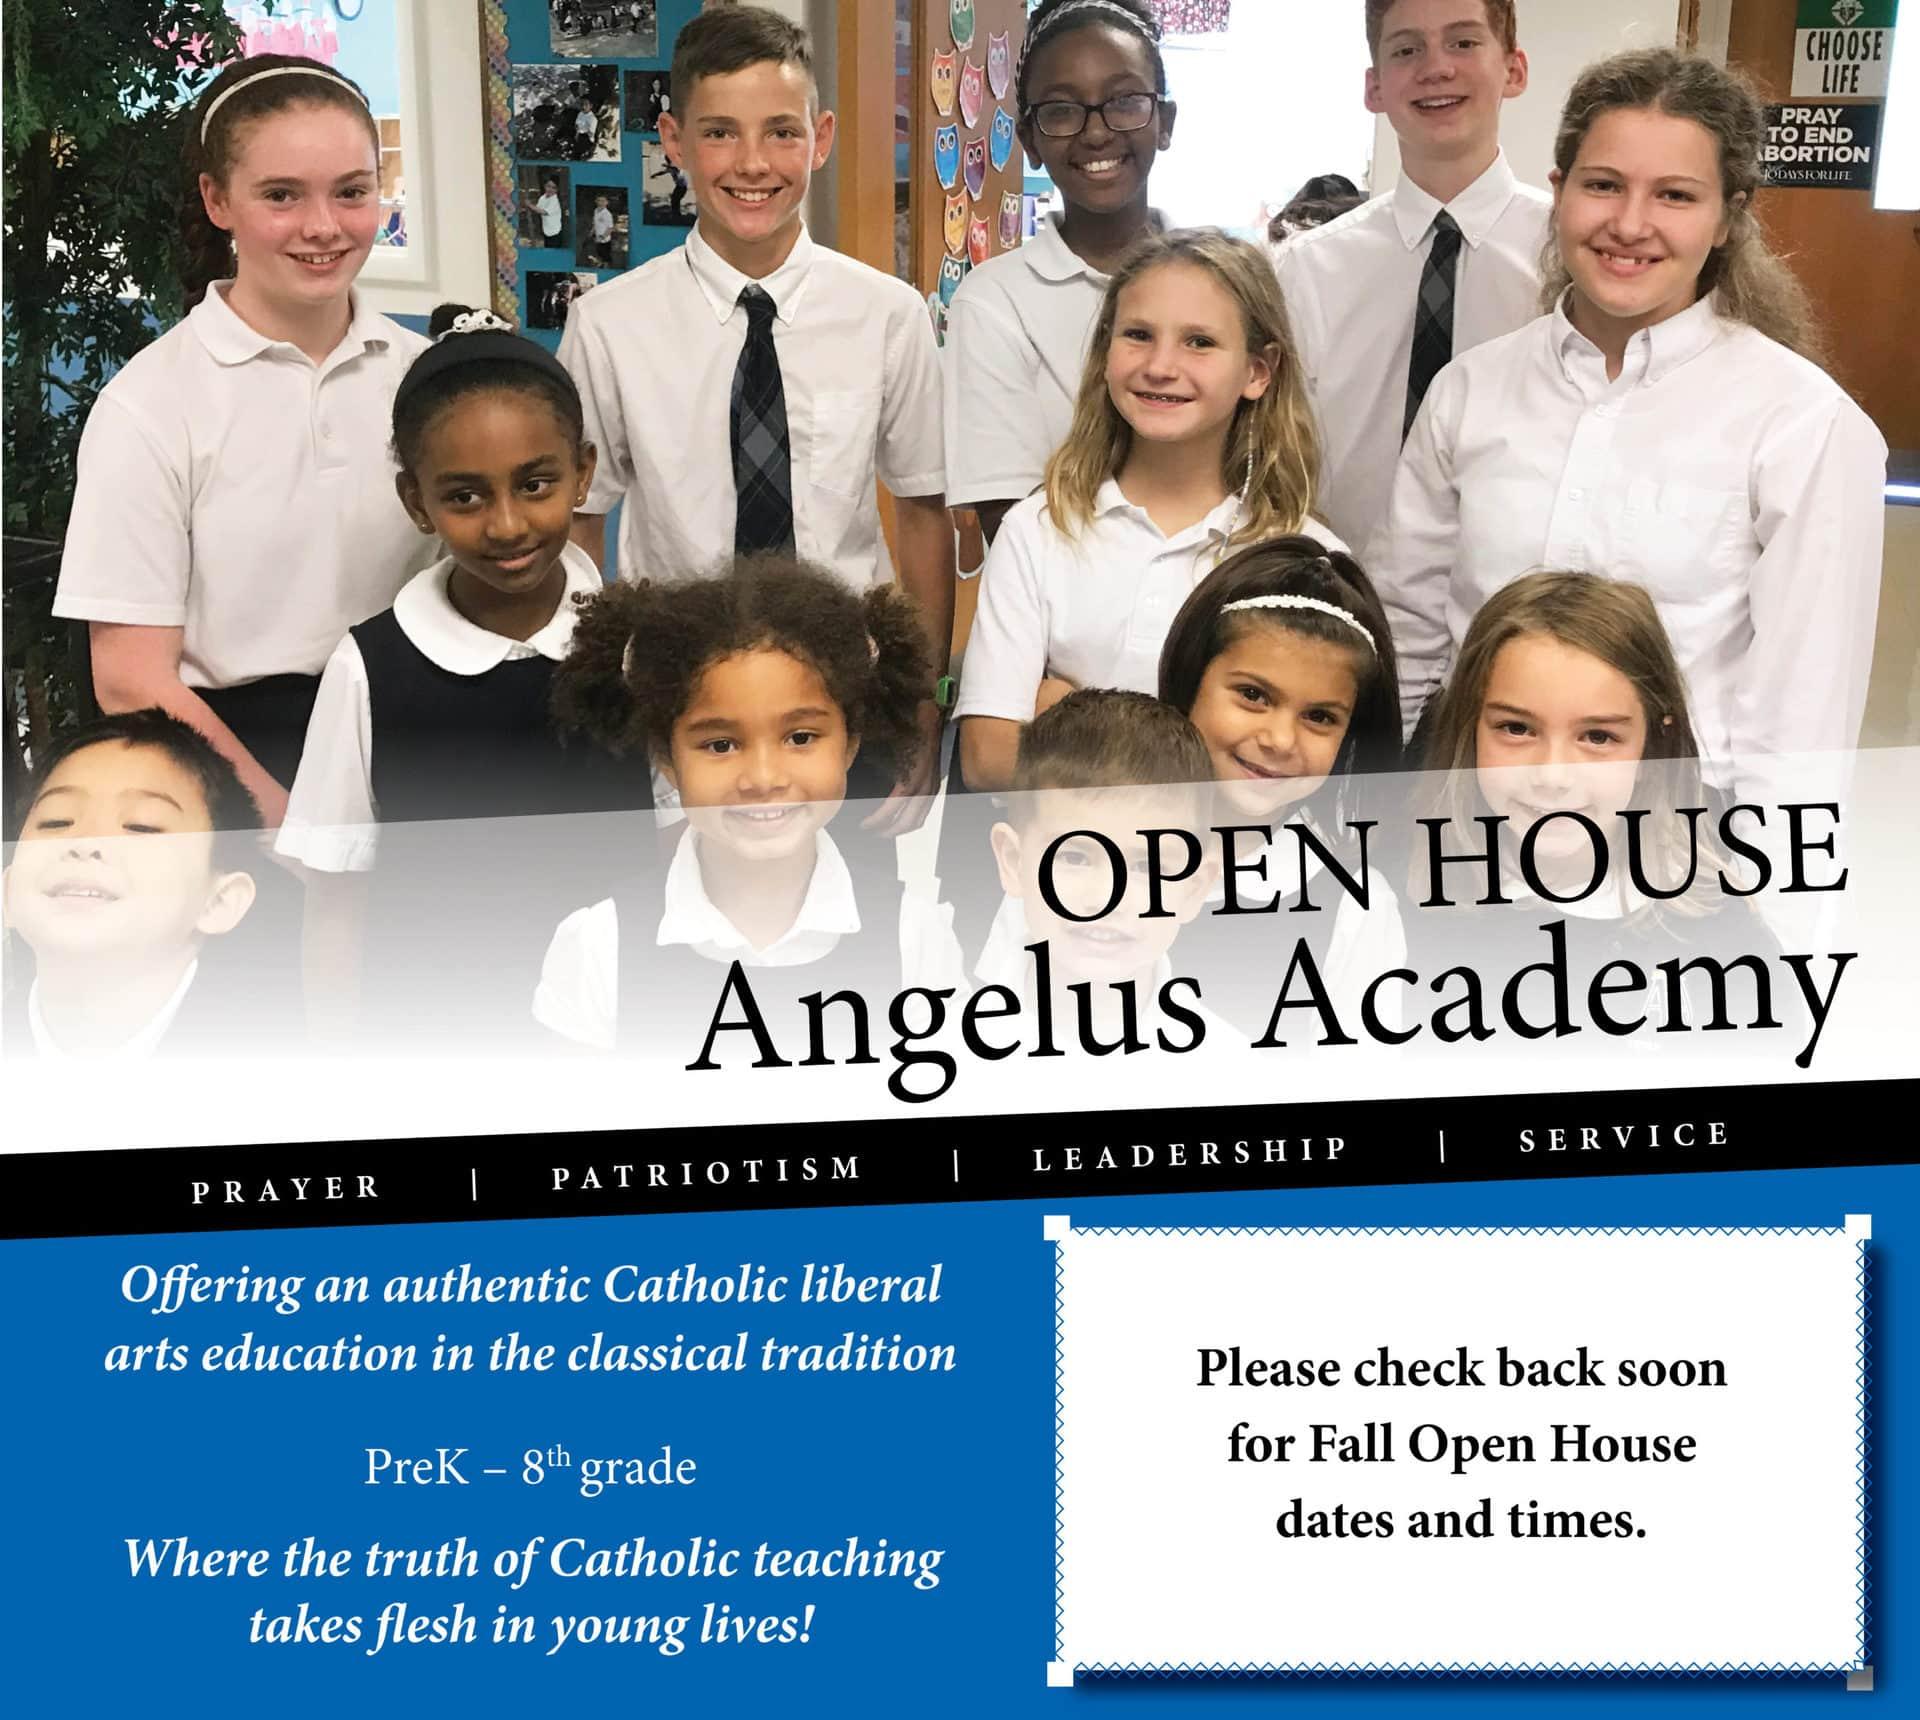 Angelus Academy Open House